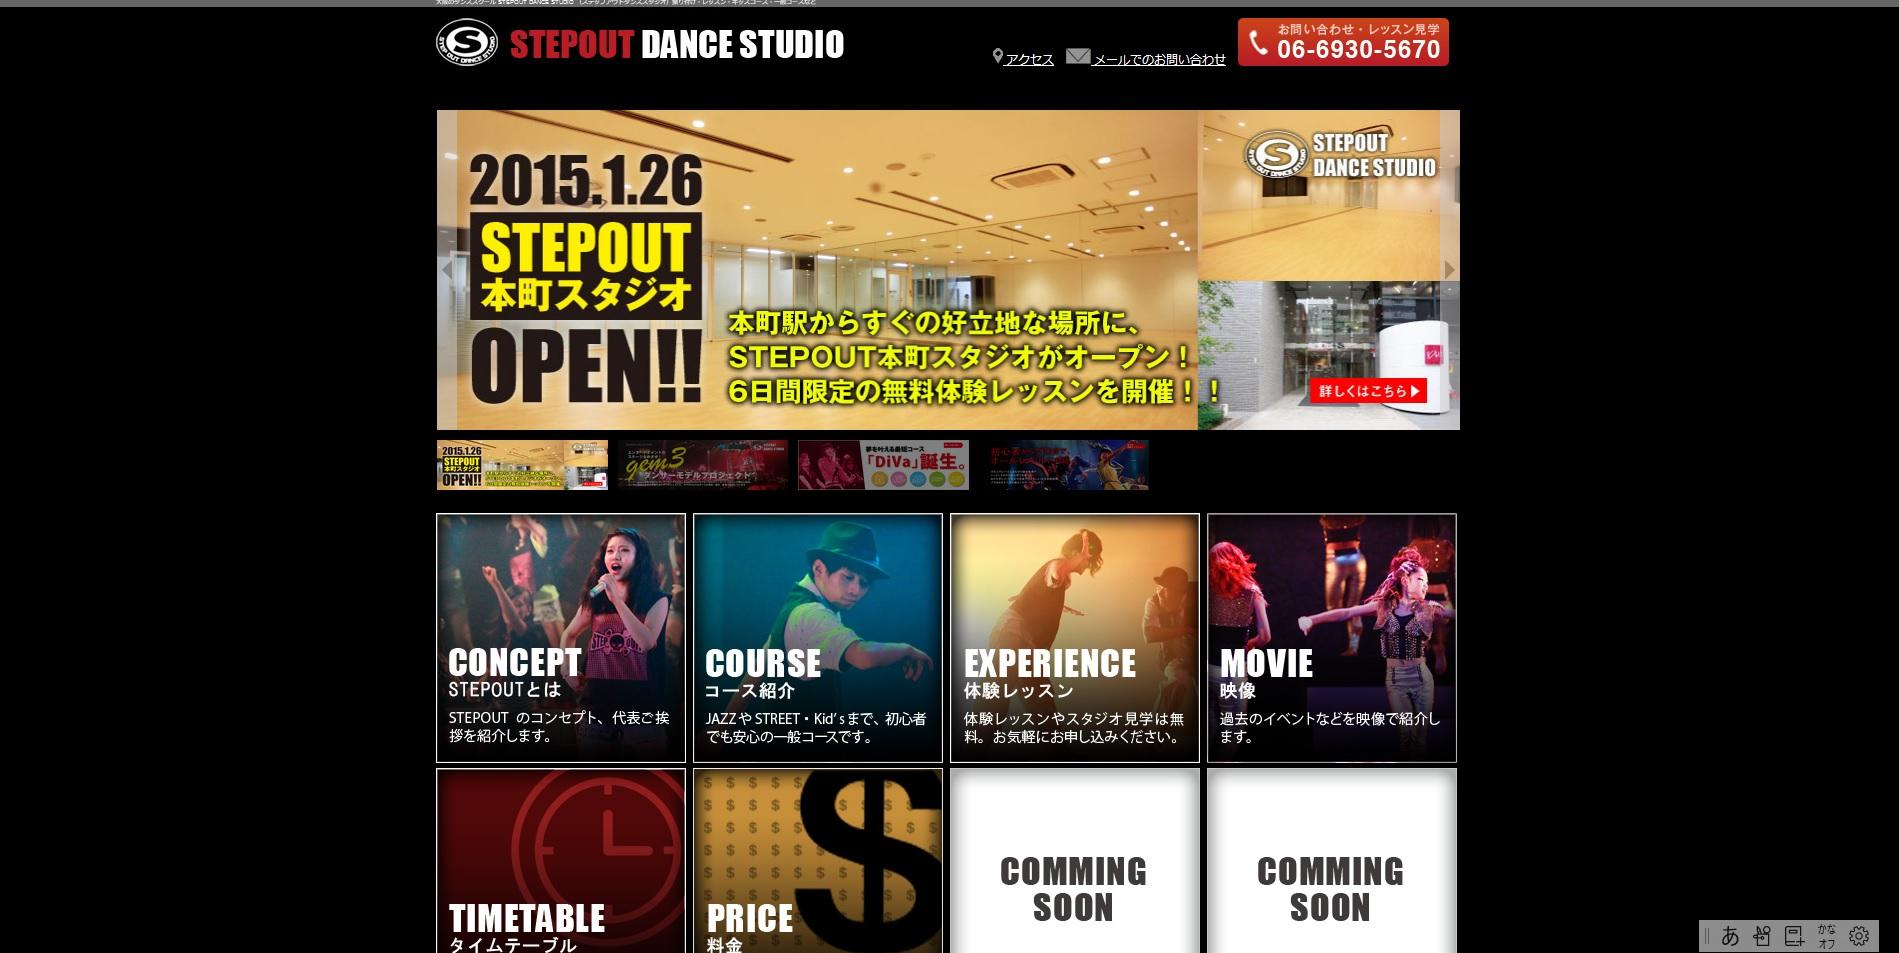 K-POPデビューを目指すダンススクール9校を徹底紹介【最新版】,sds,STEPOUT DANCE STUDIO